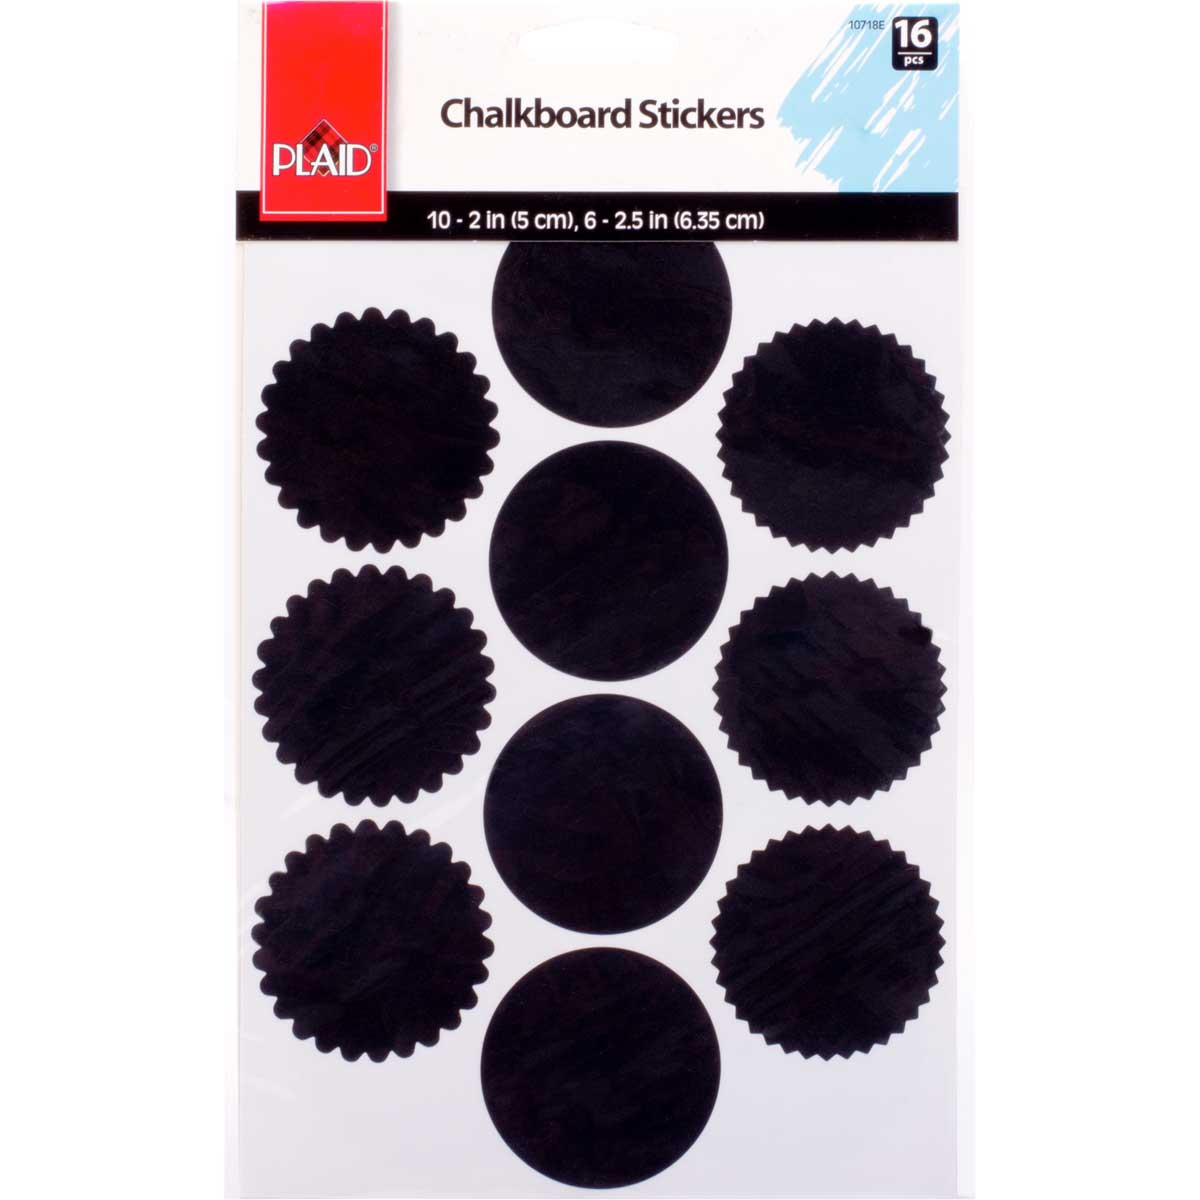 Plaid ® Chalkboard Stickers, 16 pcs. - 10718E